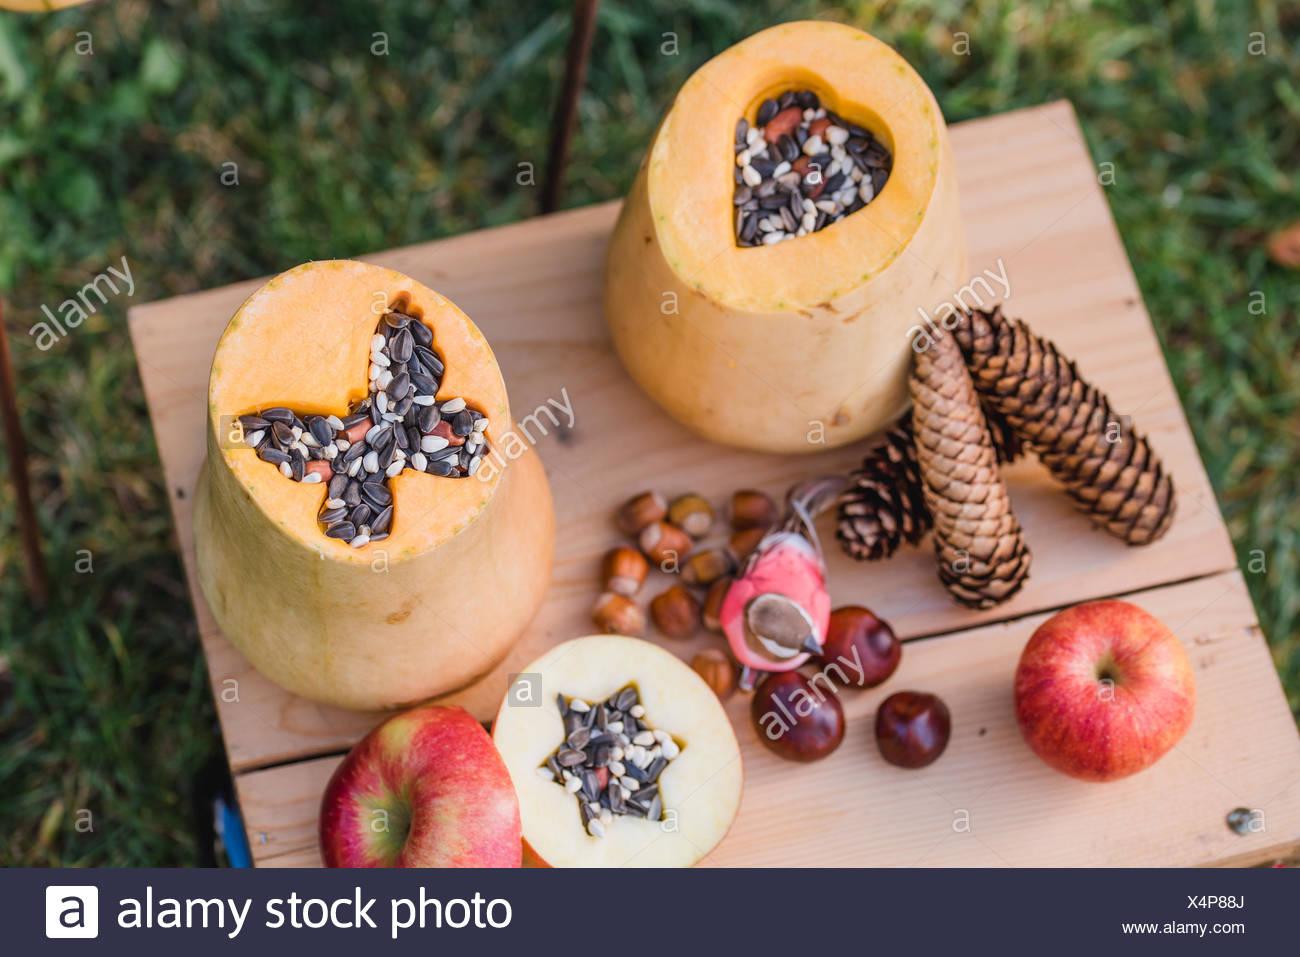 Garden, DIY, self-made bird feeder, pumpkins, apples, box, detail, - Stock Image